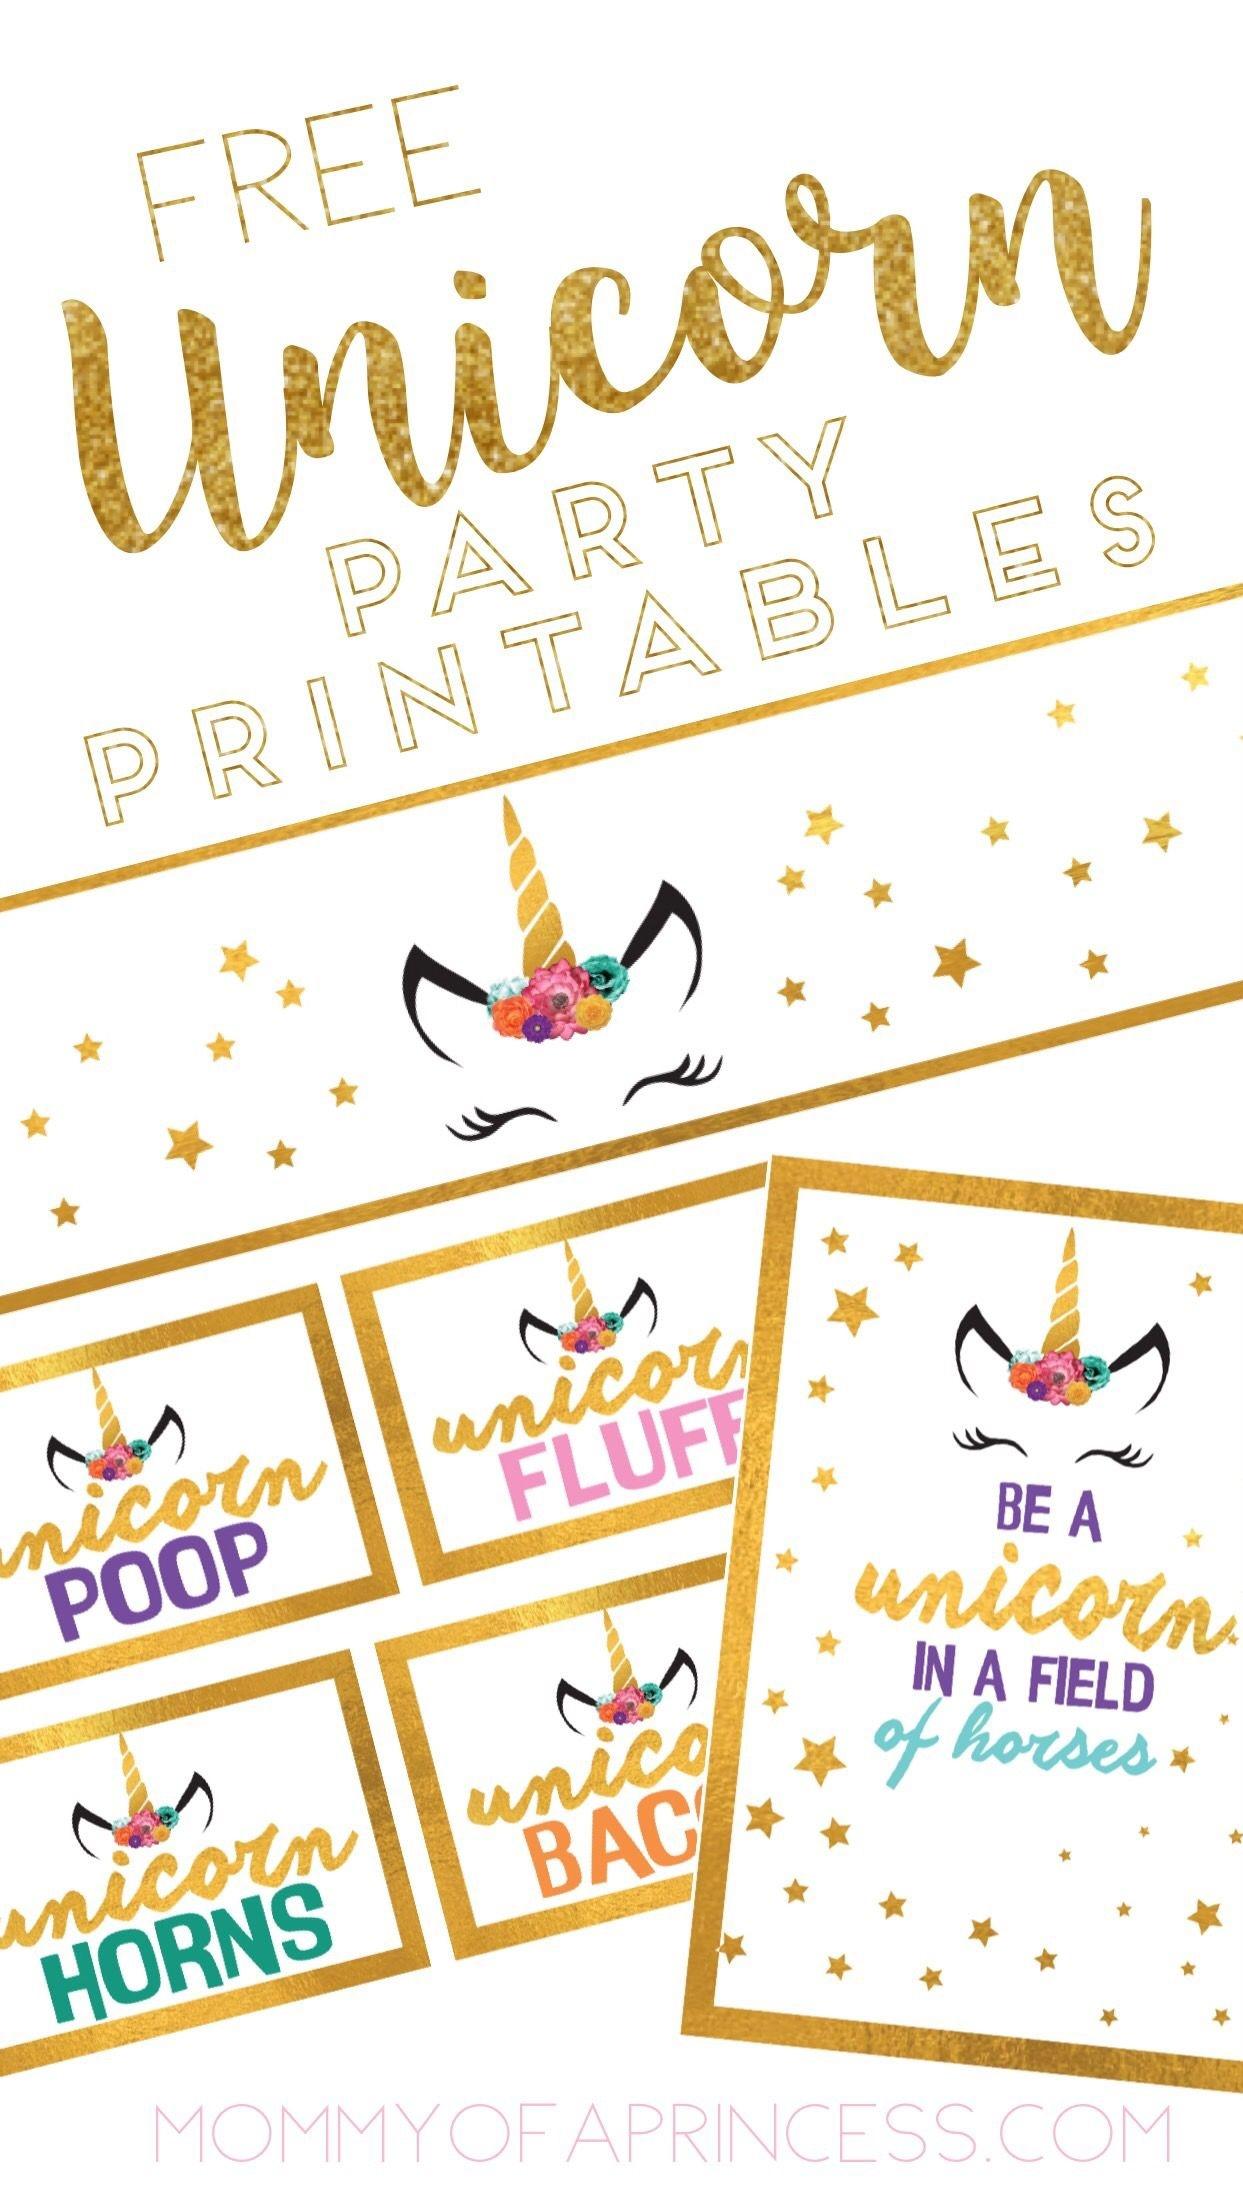 Unicorn Birthday Party Ideas With Free Printable Download | Feestje - Free Unicorn Party Printables